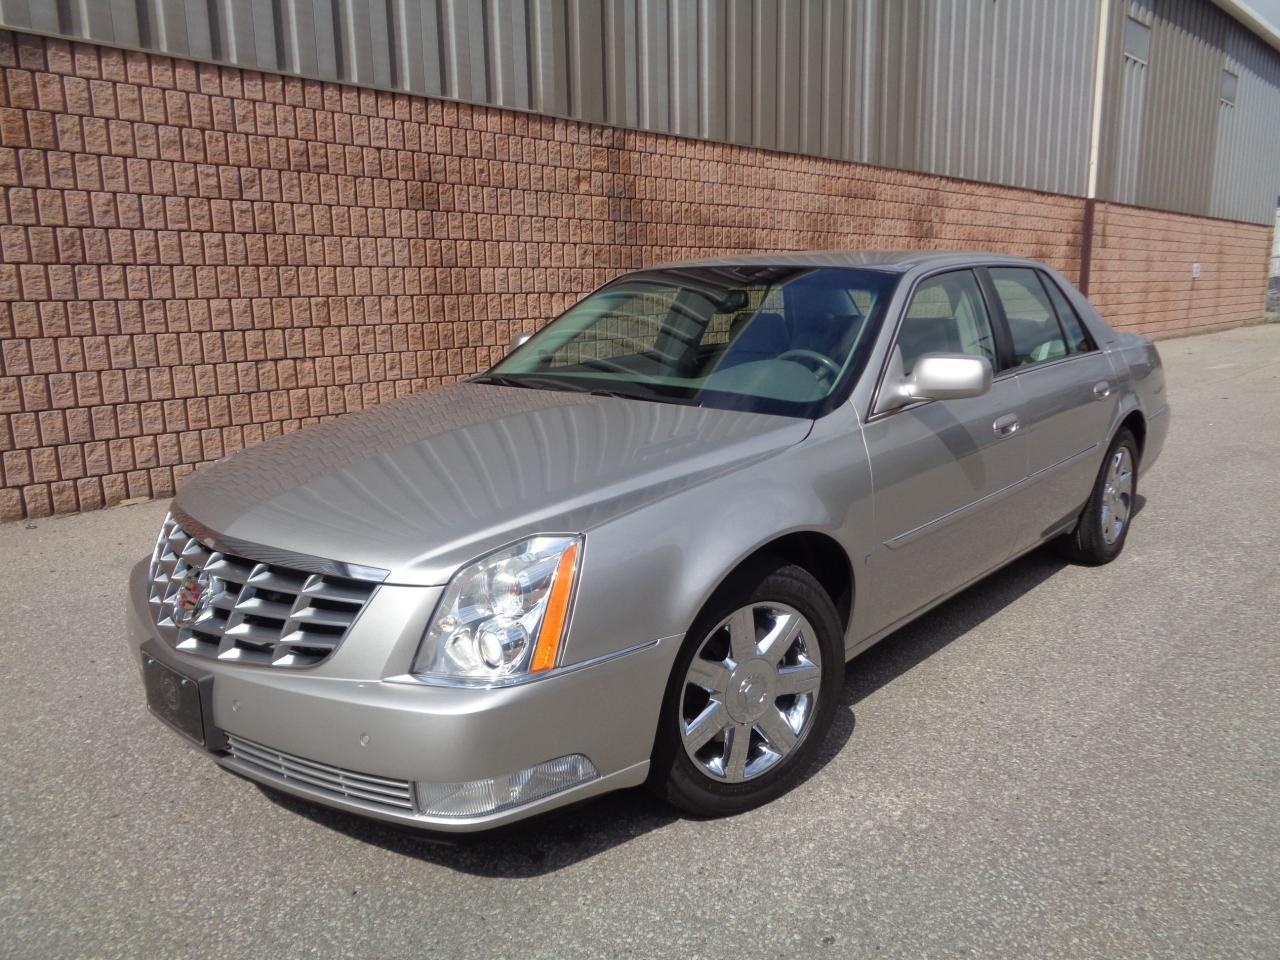 Photo of Silver 2007 Cadillac DTS